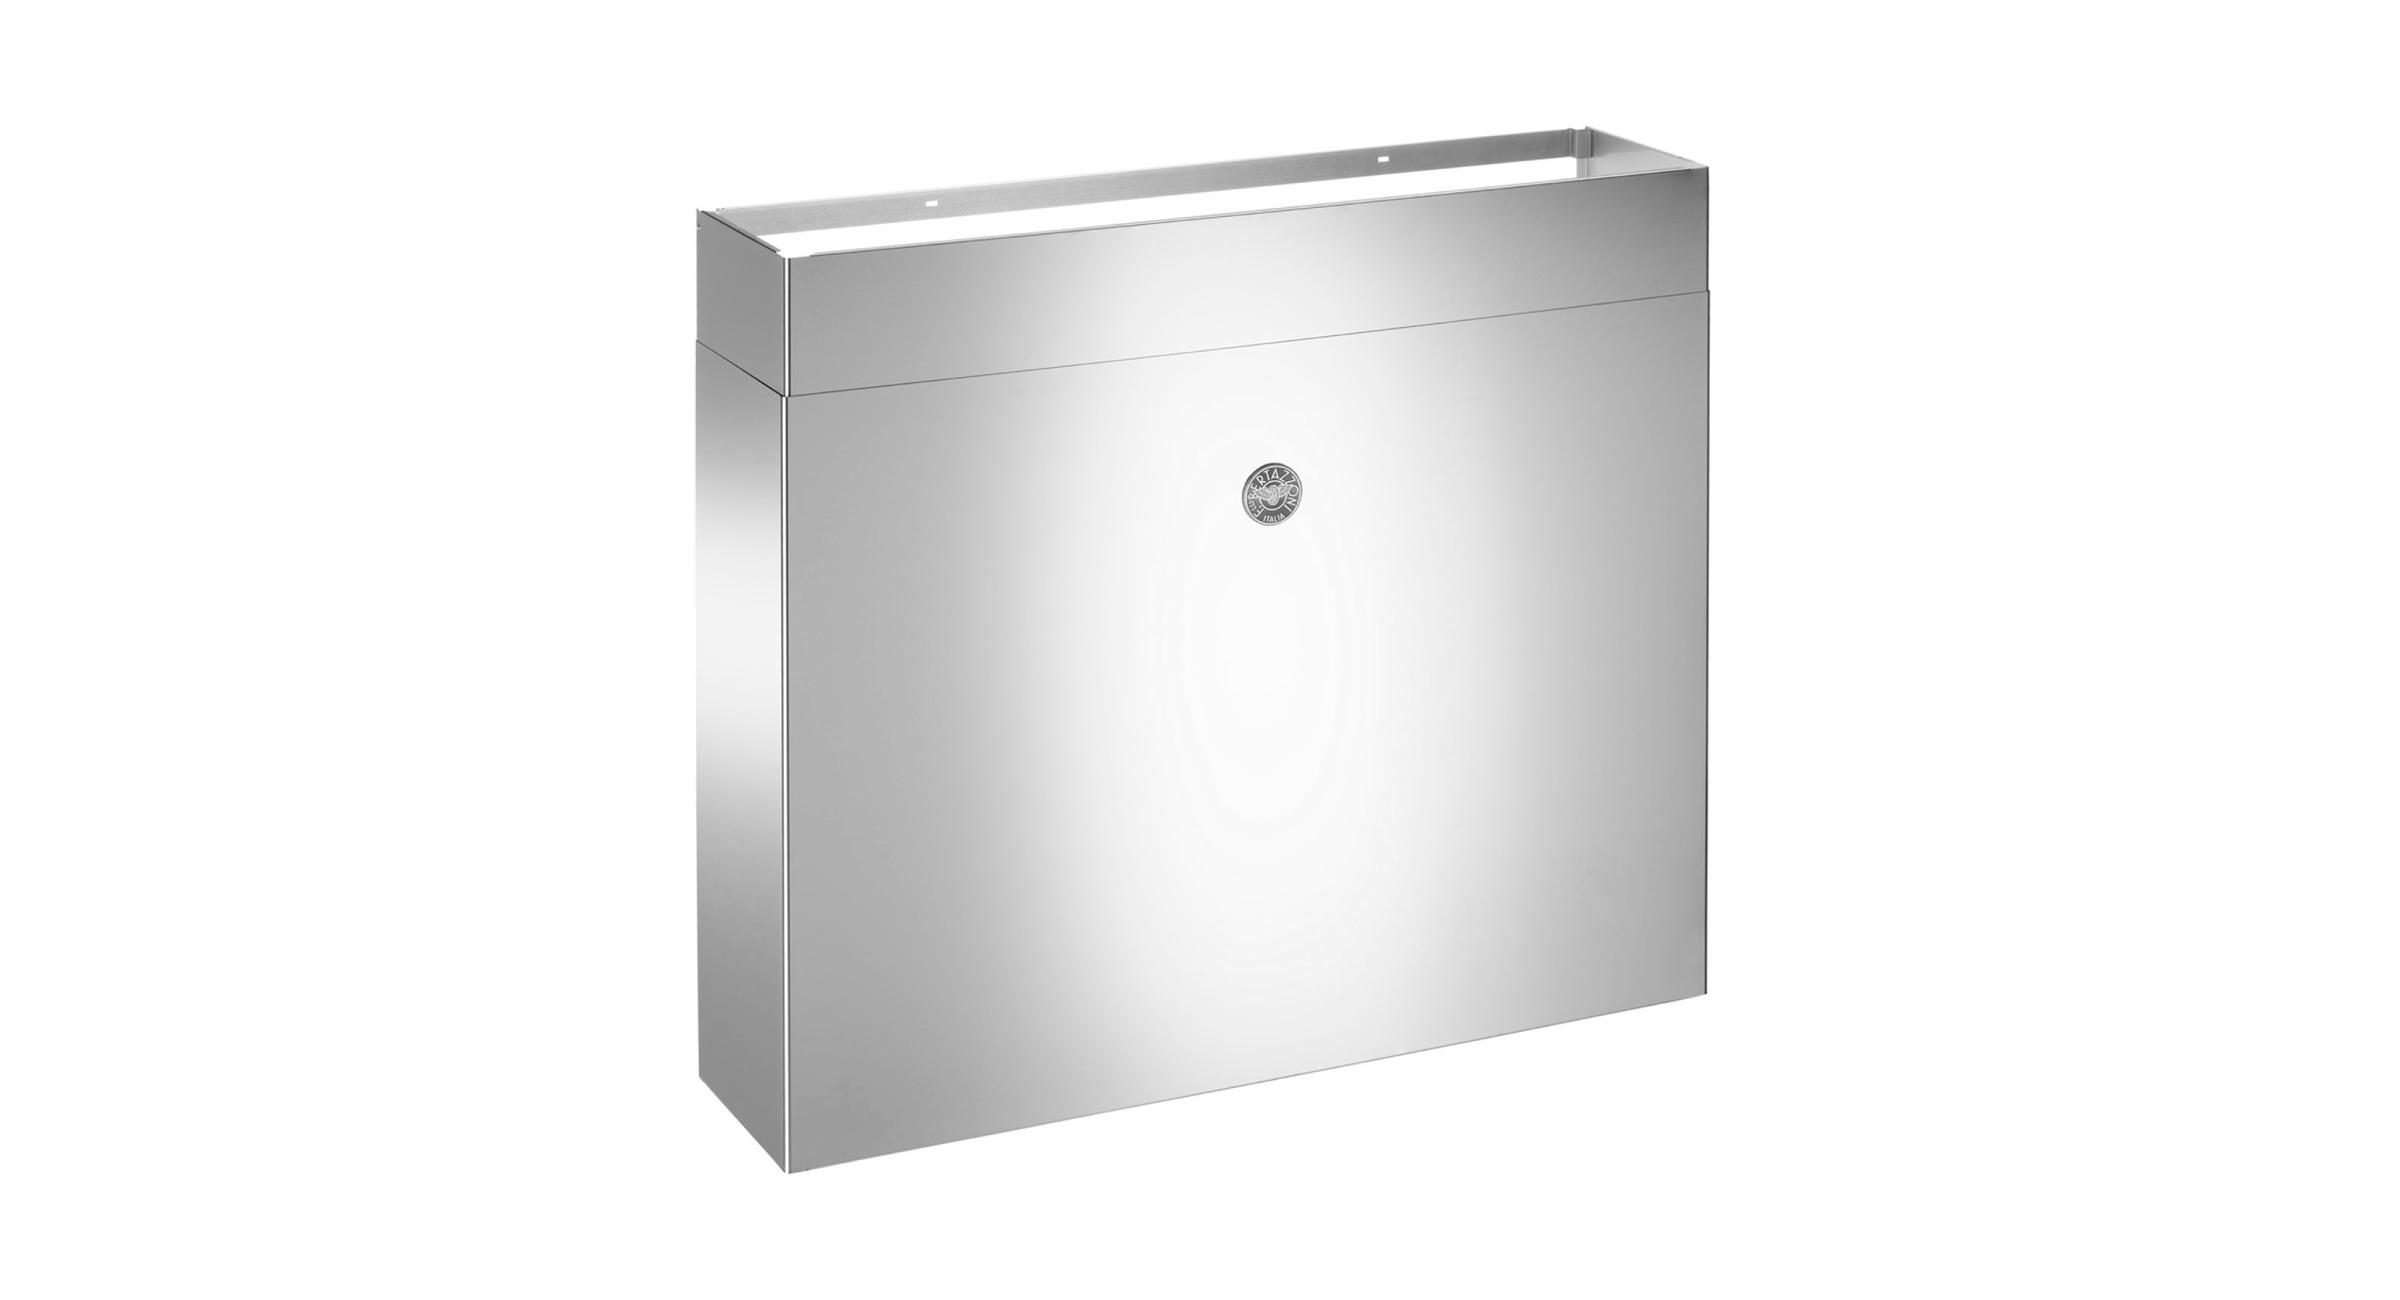 Bertazzoni 2x Universal Adjustable Oven Cooker Shelf Rack Grill 400mm To 550mm